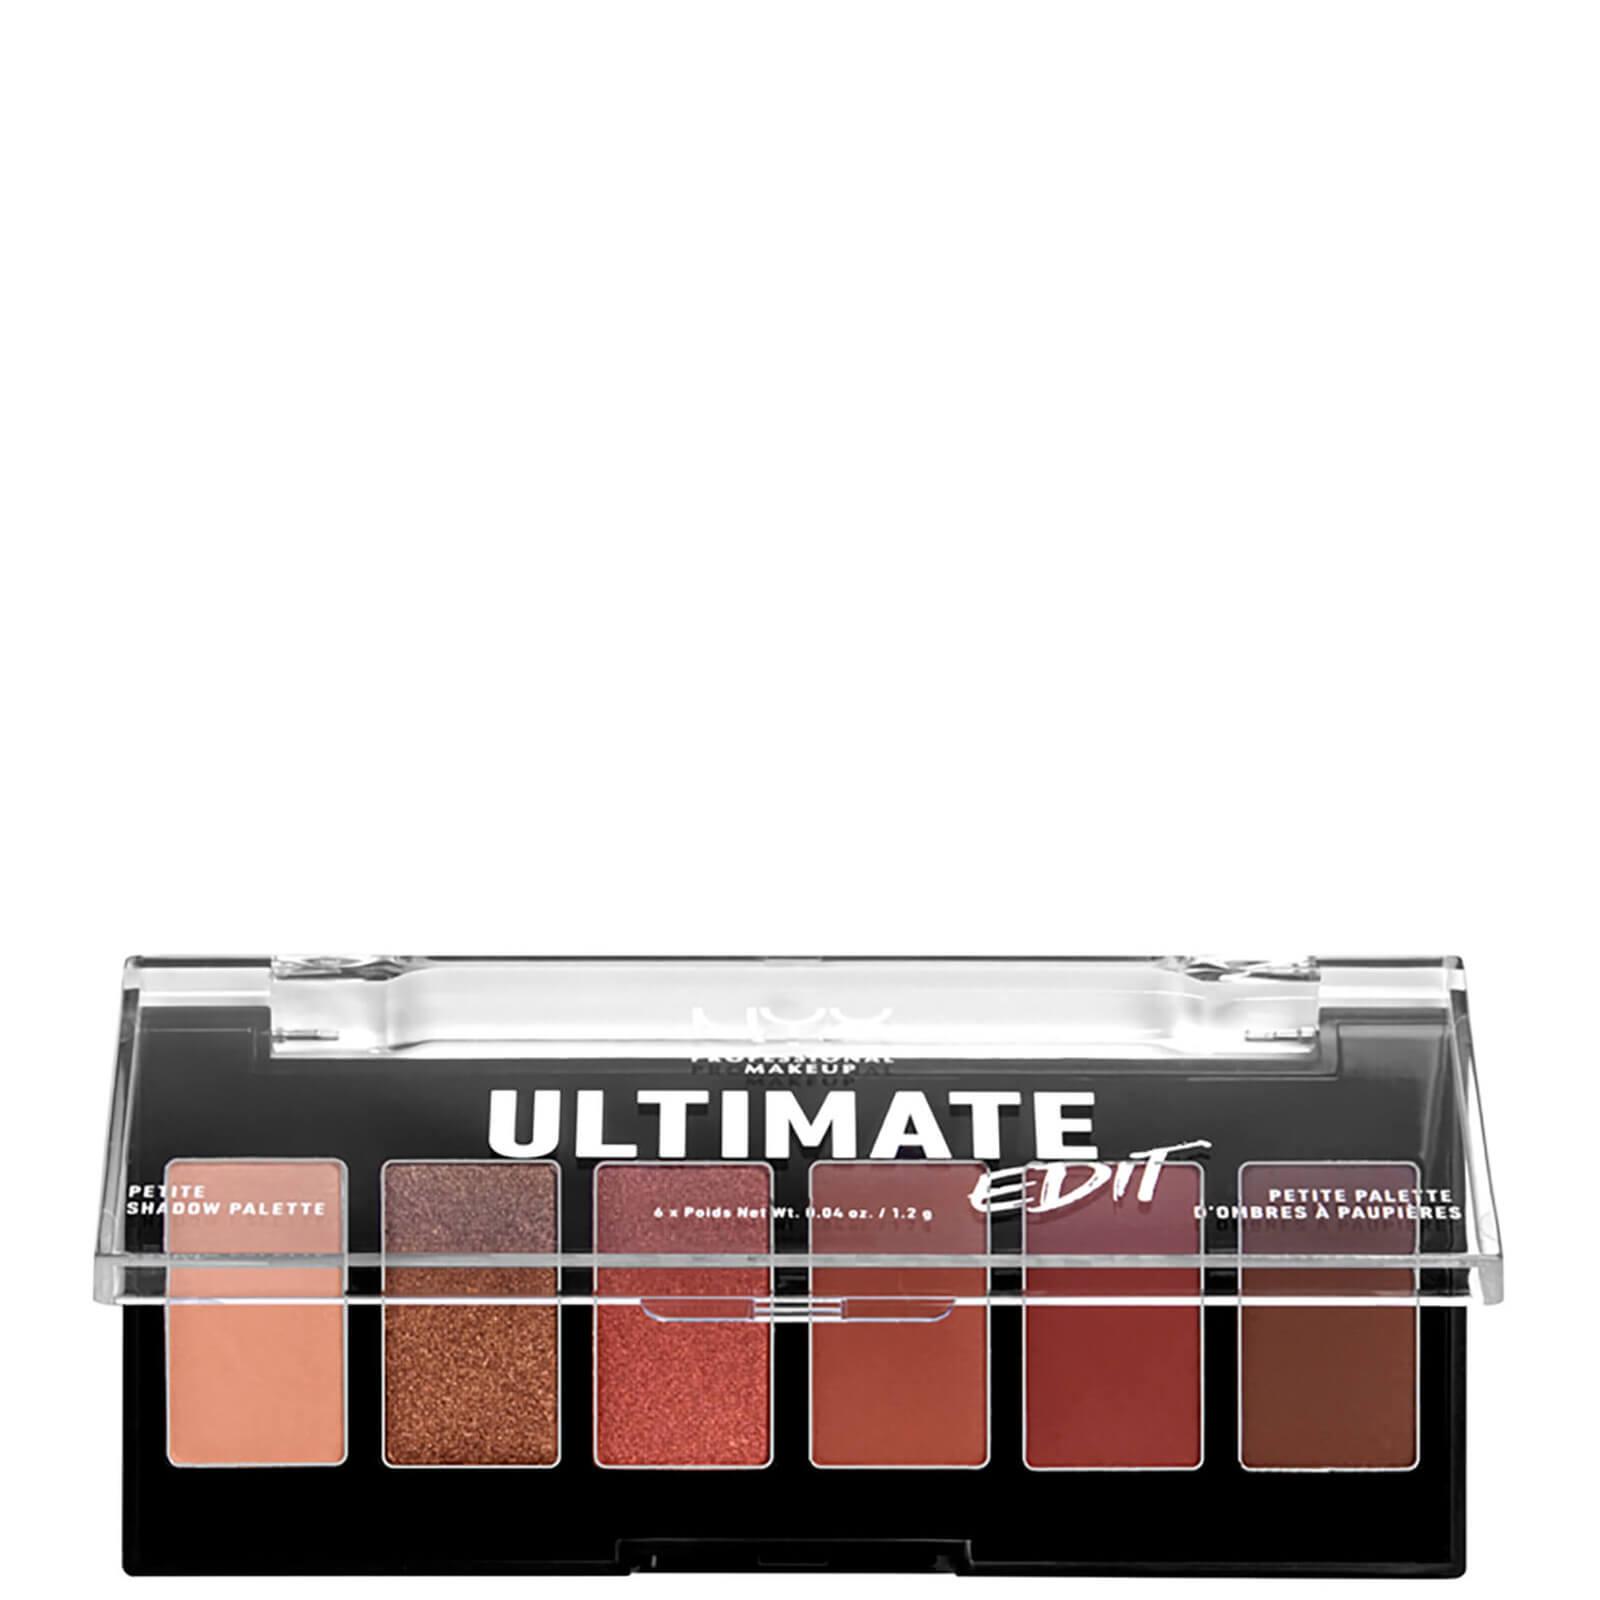 Купить NYX Professional Makeup Ultimate Edit Petite Eye Shadow Palette - Warm Neutrals